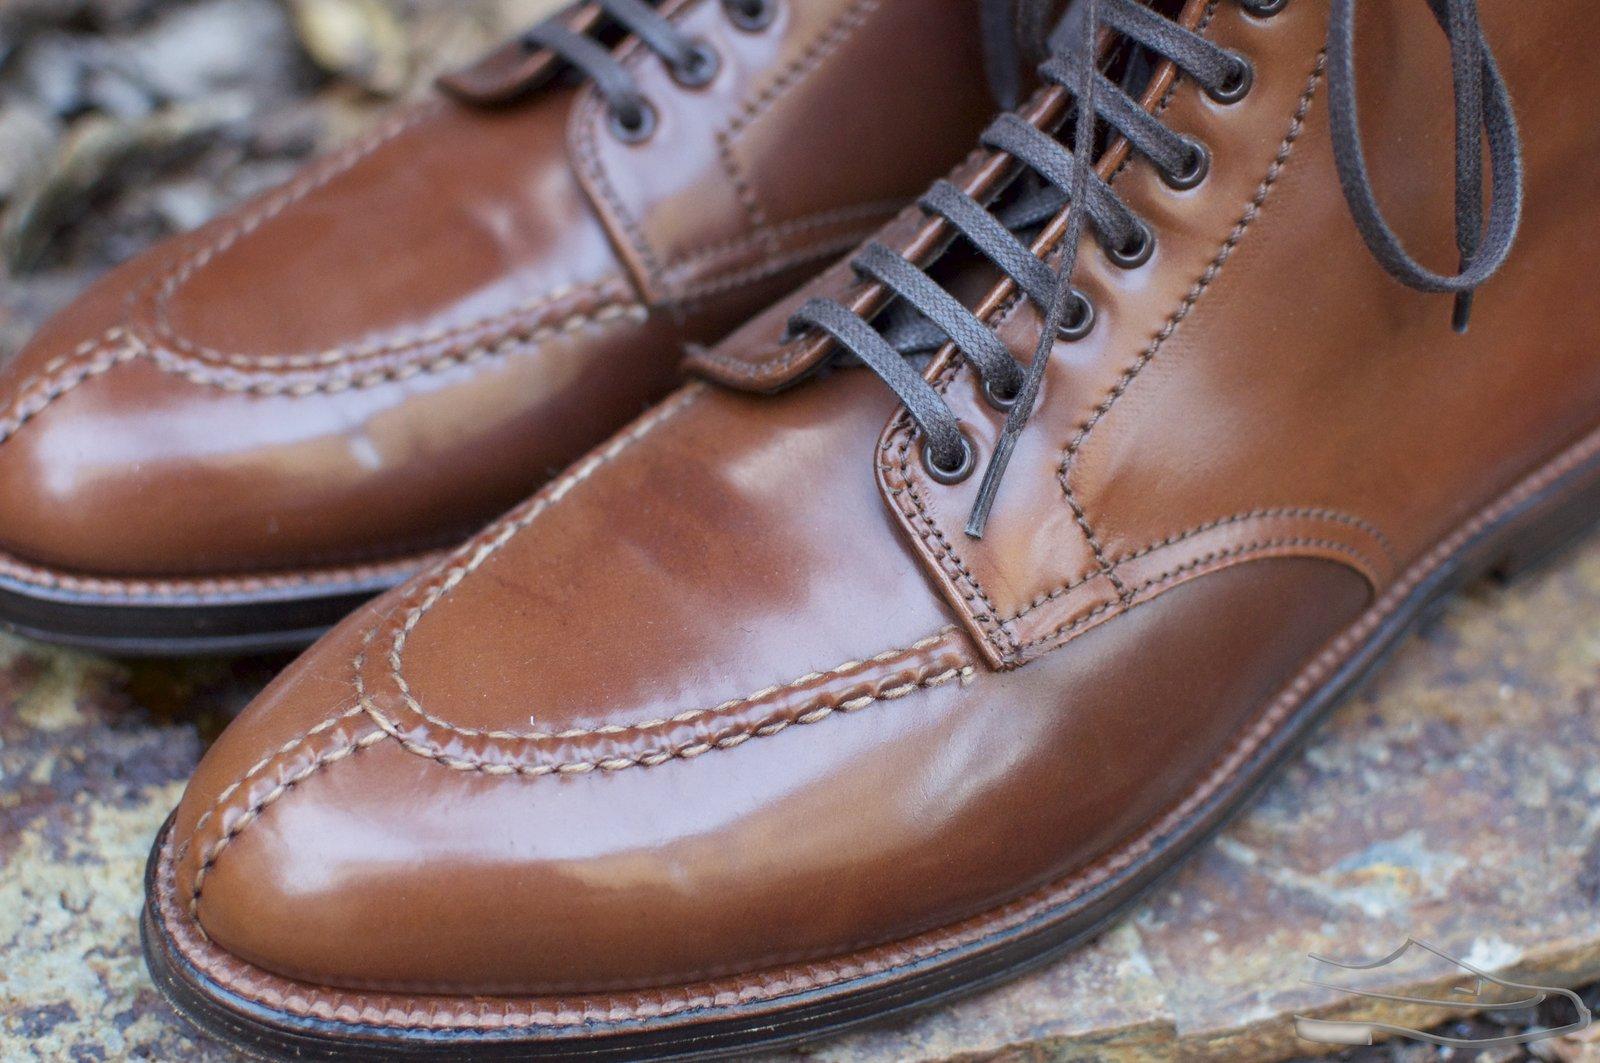 Alden Ravello Shell Cordovan NST Boots - 2020-09-17 - 3.jpg